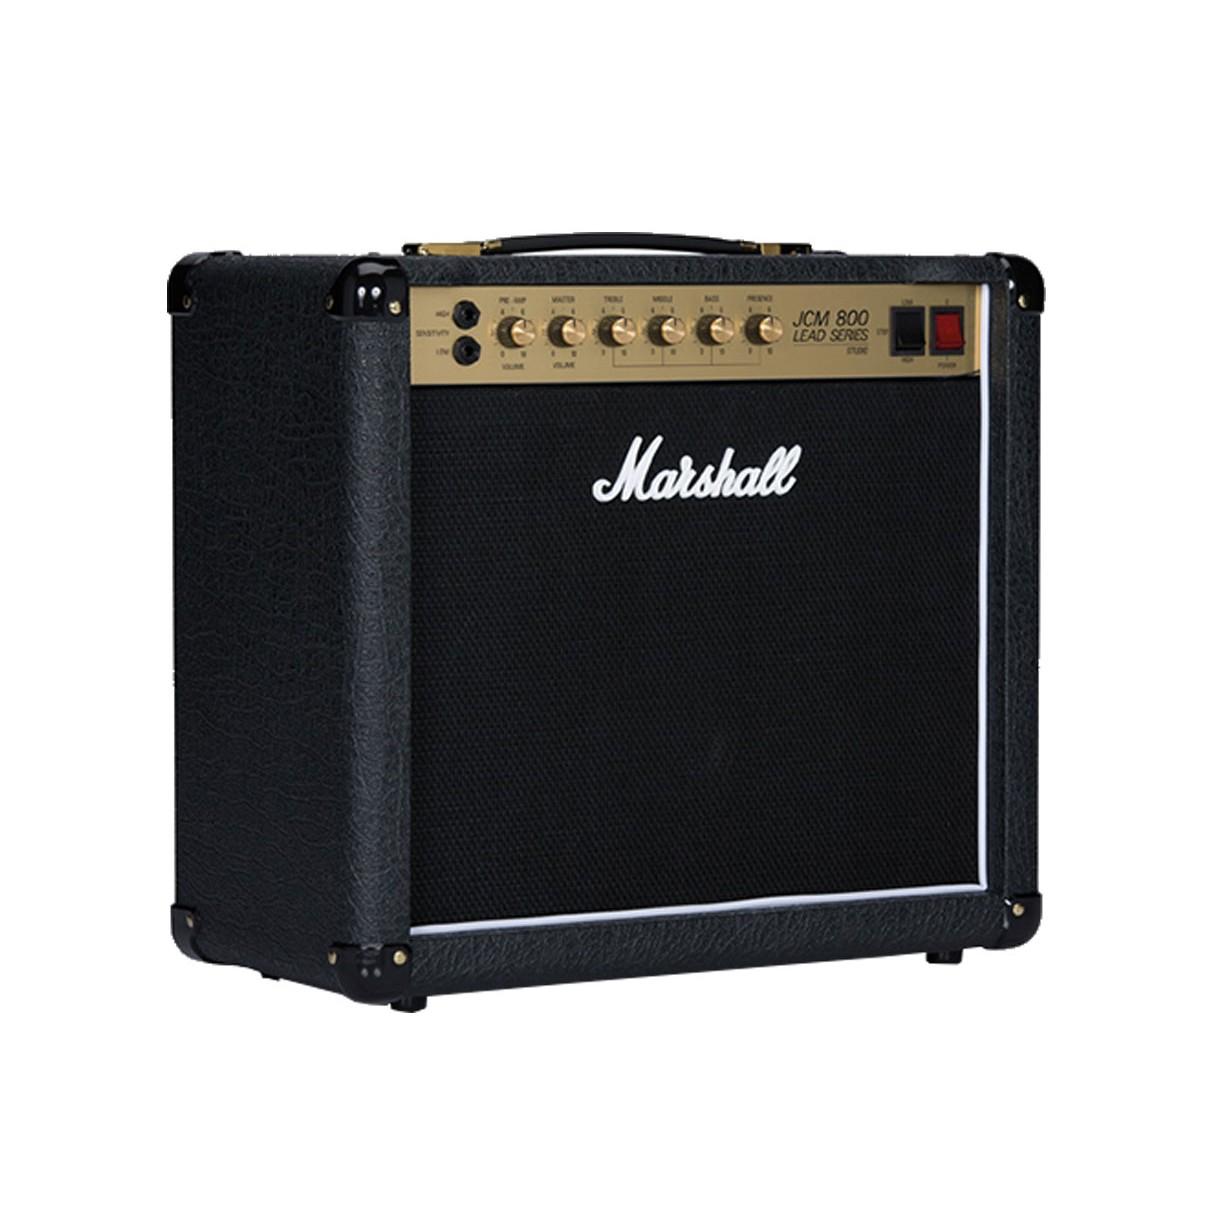 marshall sc20c 20 watt 2203 jcm800 1x10 combo amp. Black Bedroom Furniture Sets. Home Design Ideas